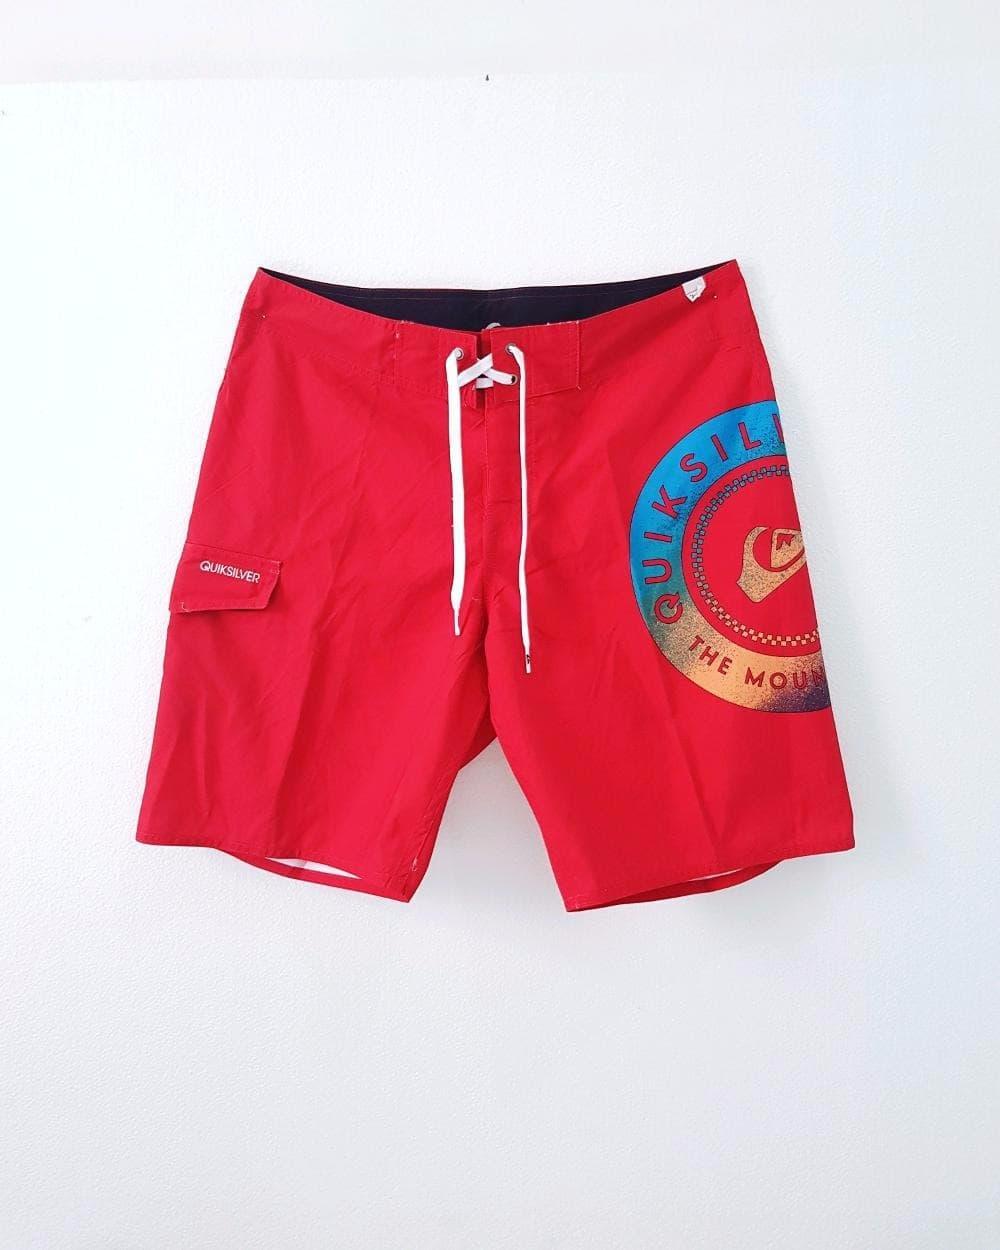 EXCLUSIVE celana pendek pantai quiksilver original not billabong ripc